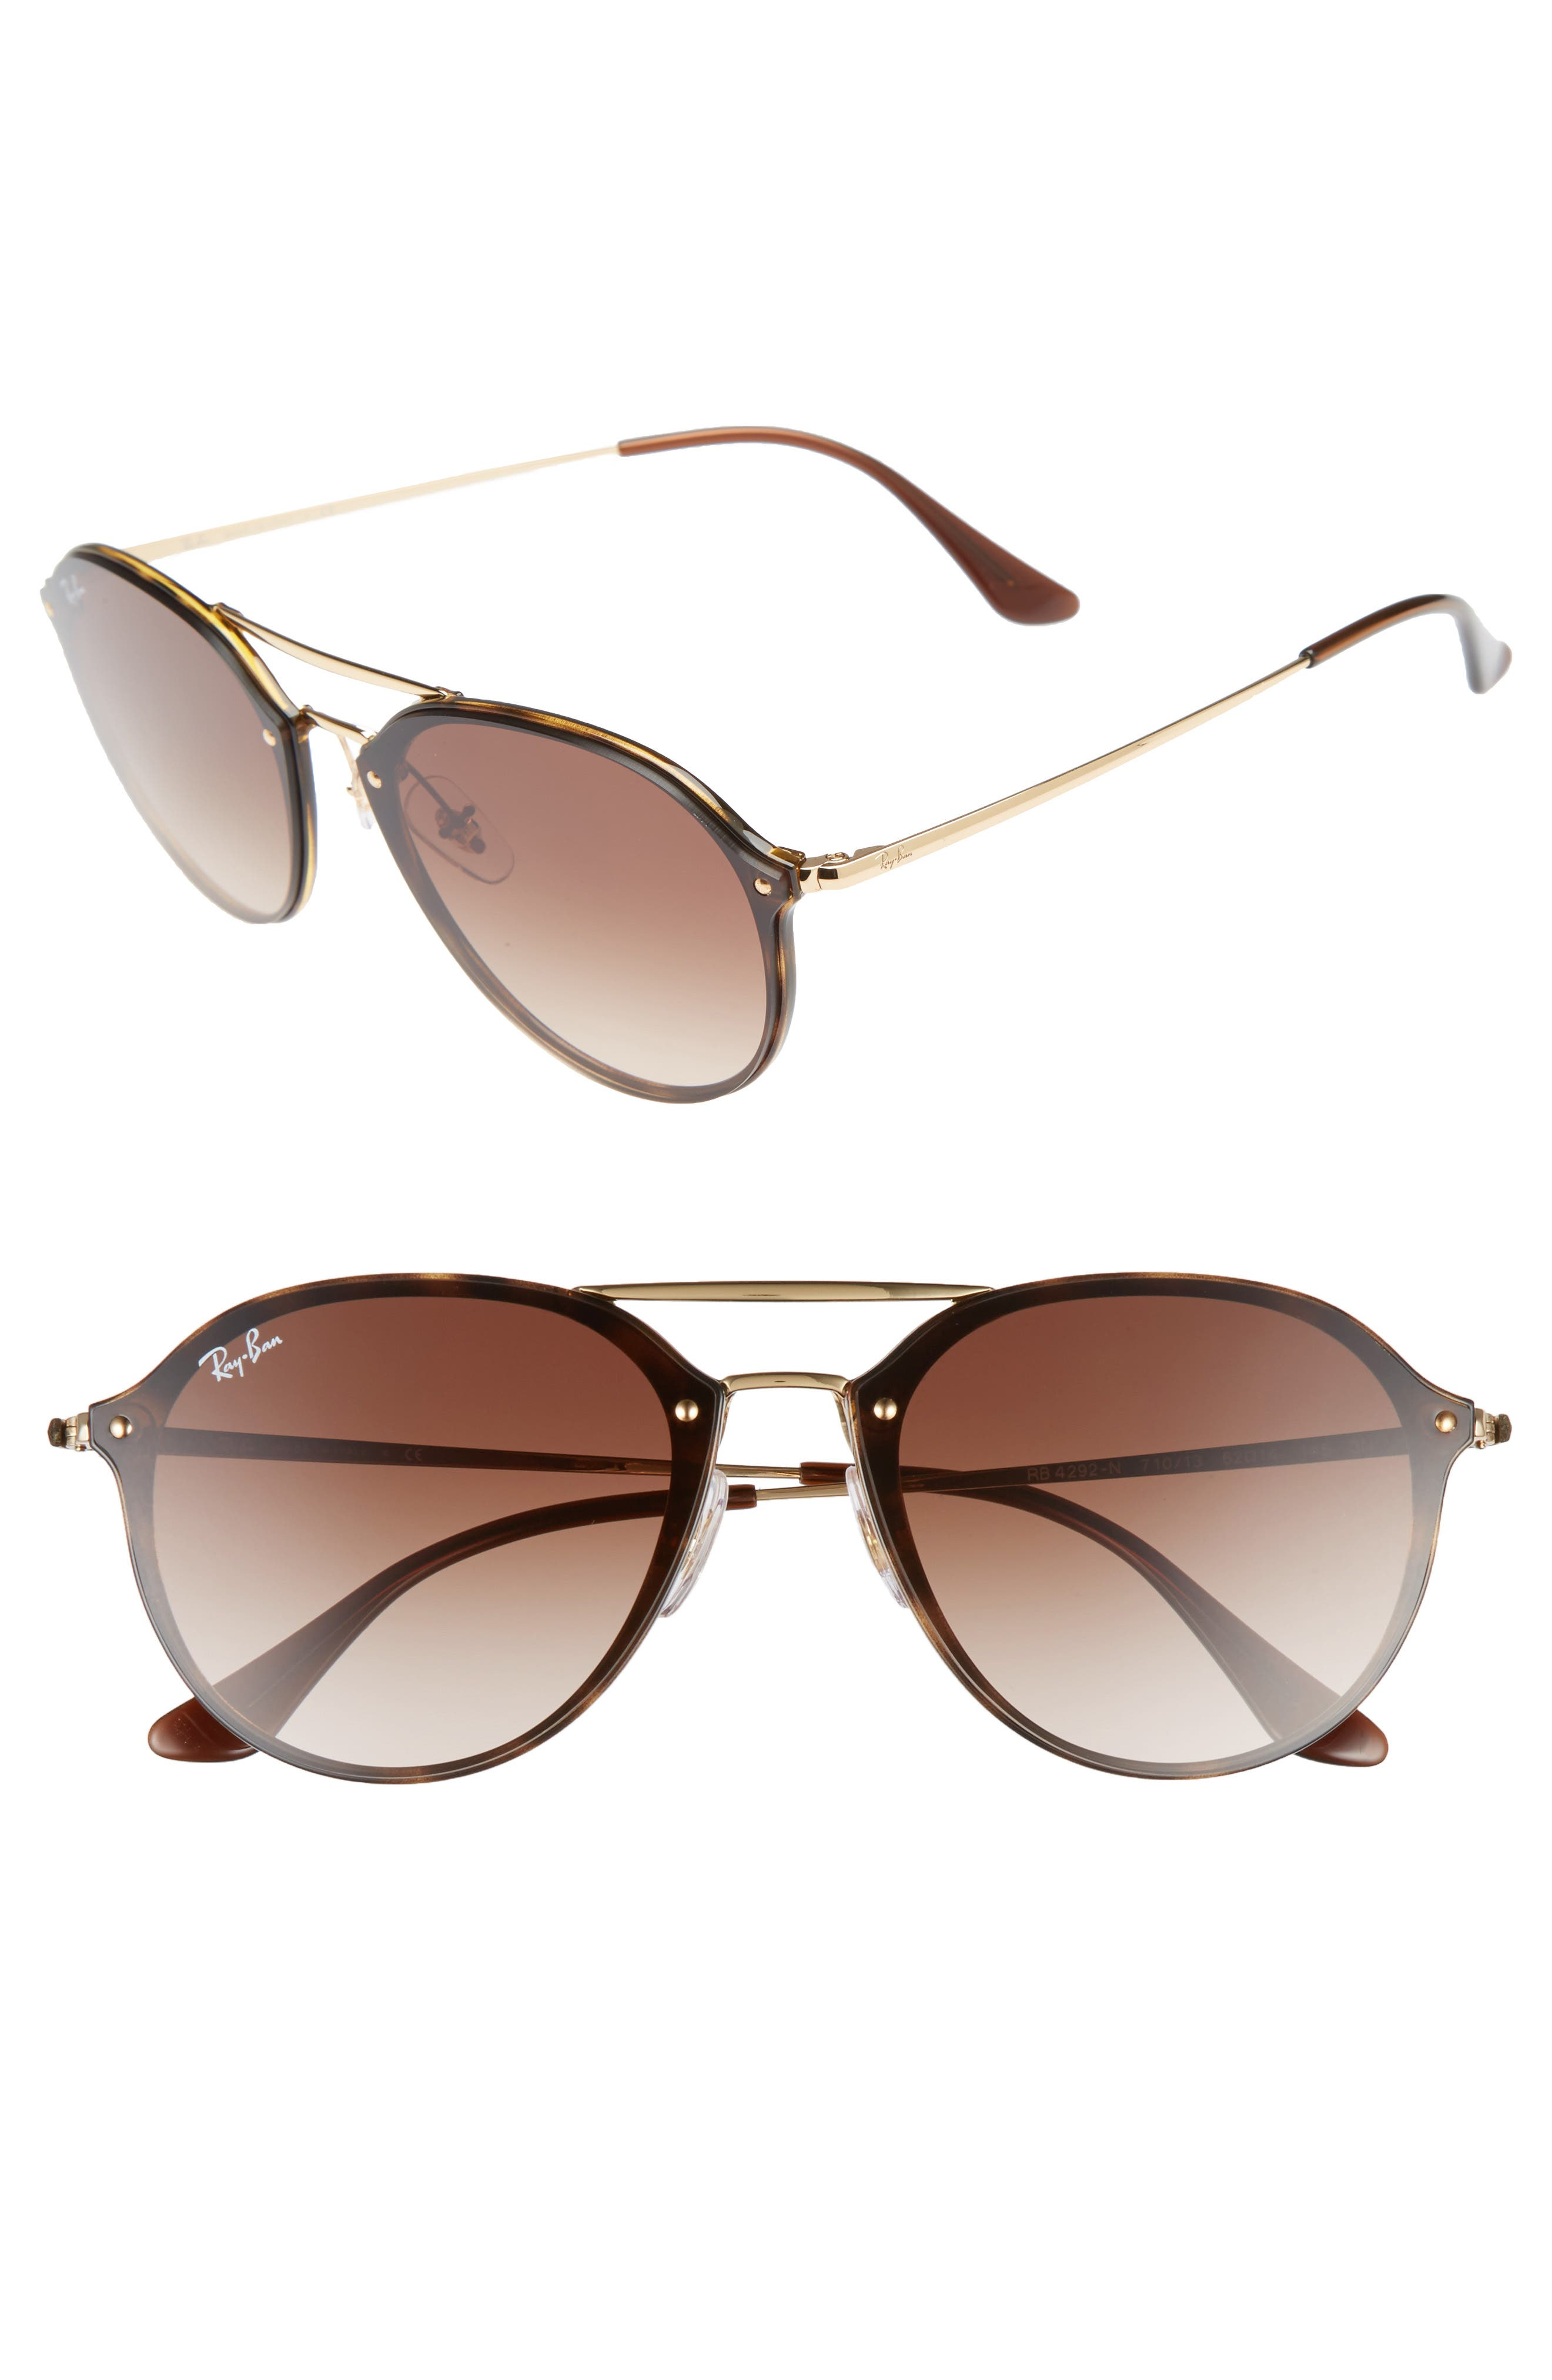 RAY-BAN, 62mm Gradient Lens Aviator Sunglasses, Main thumbnail 1, color, HAVANA